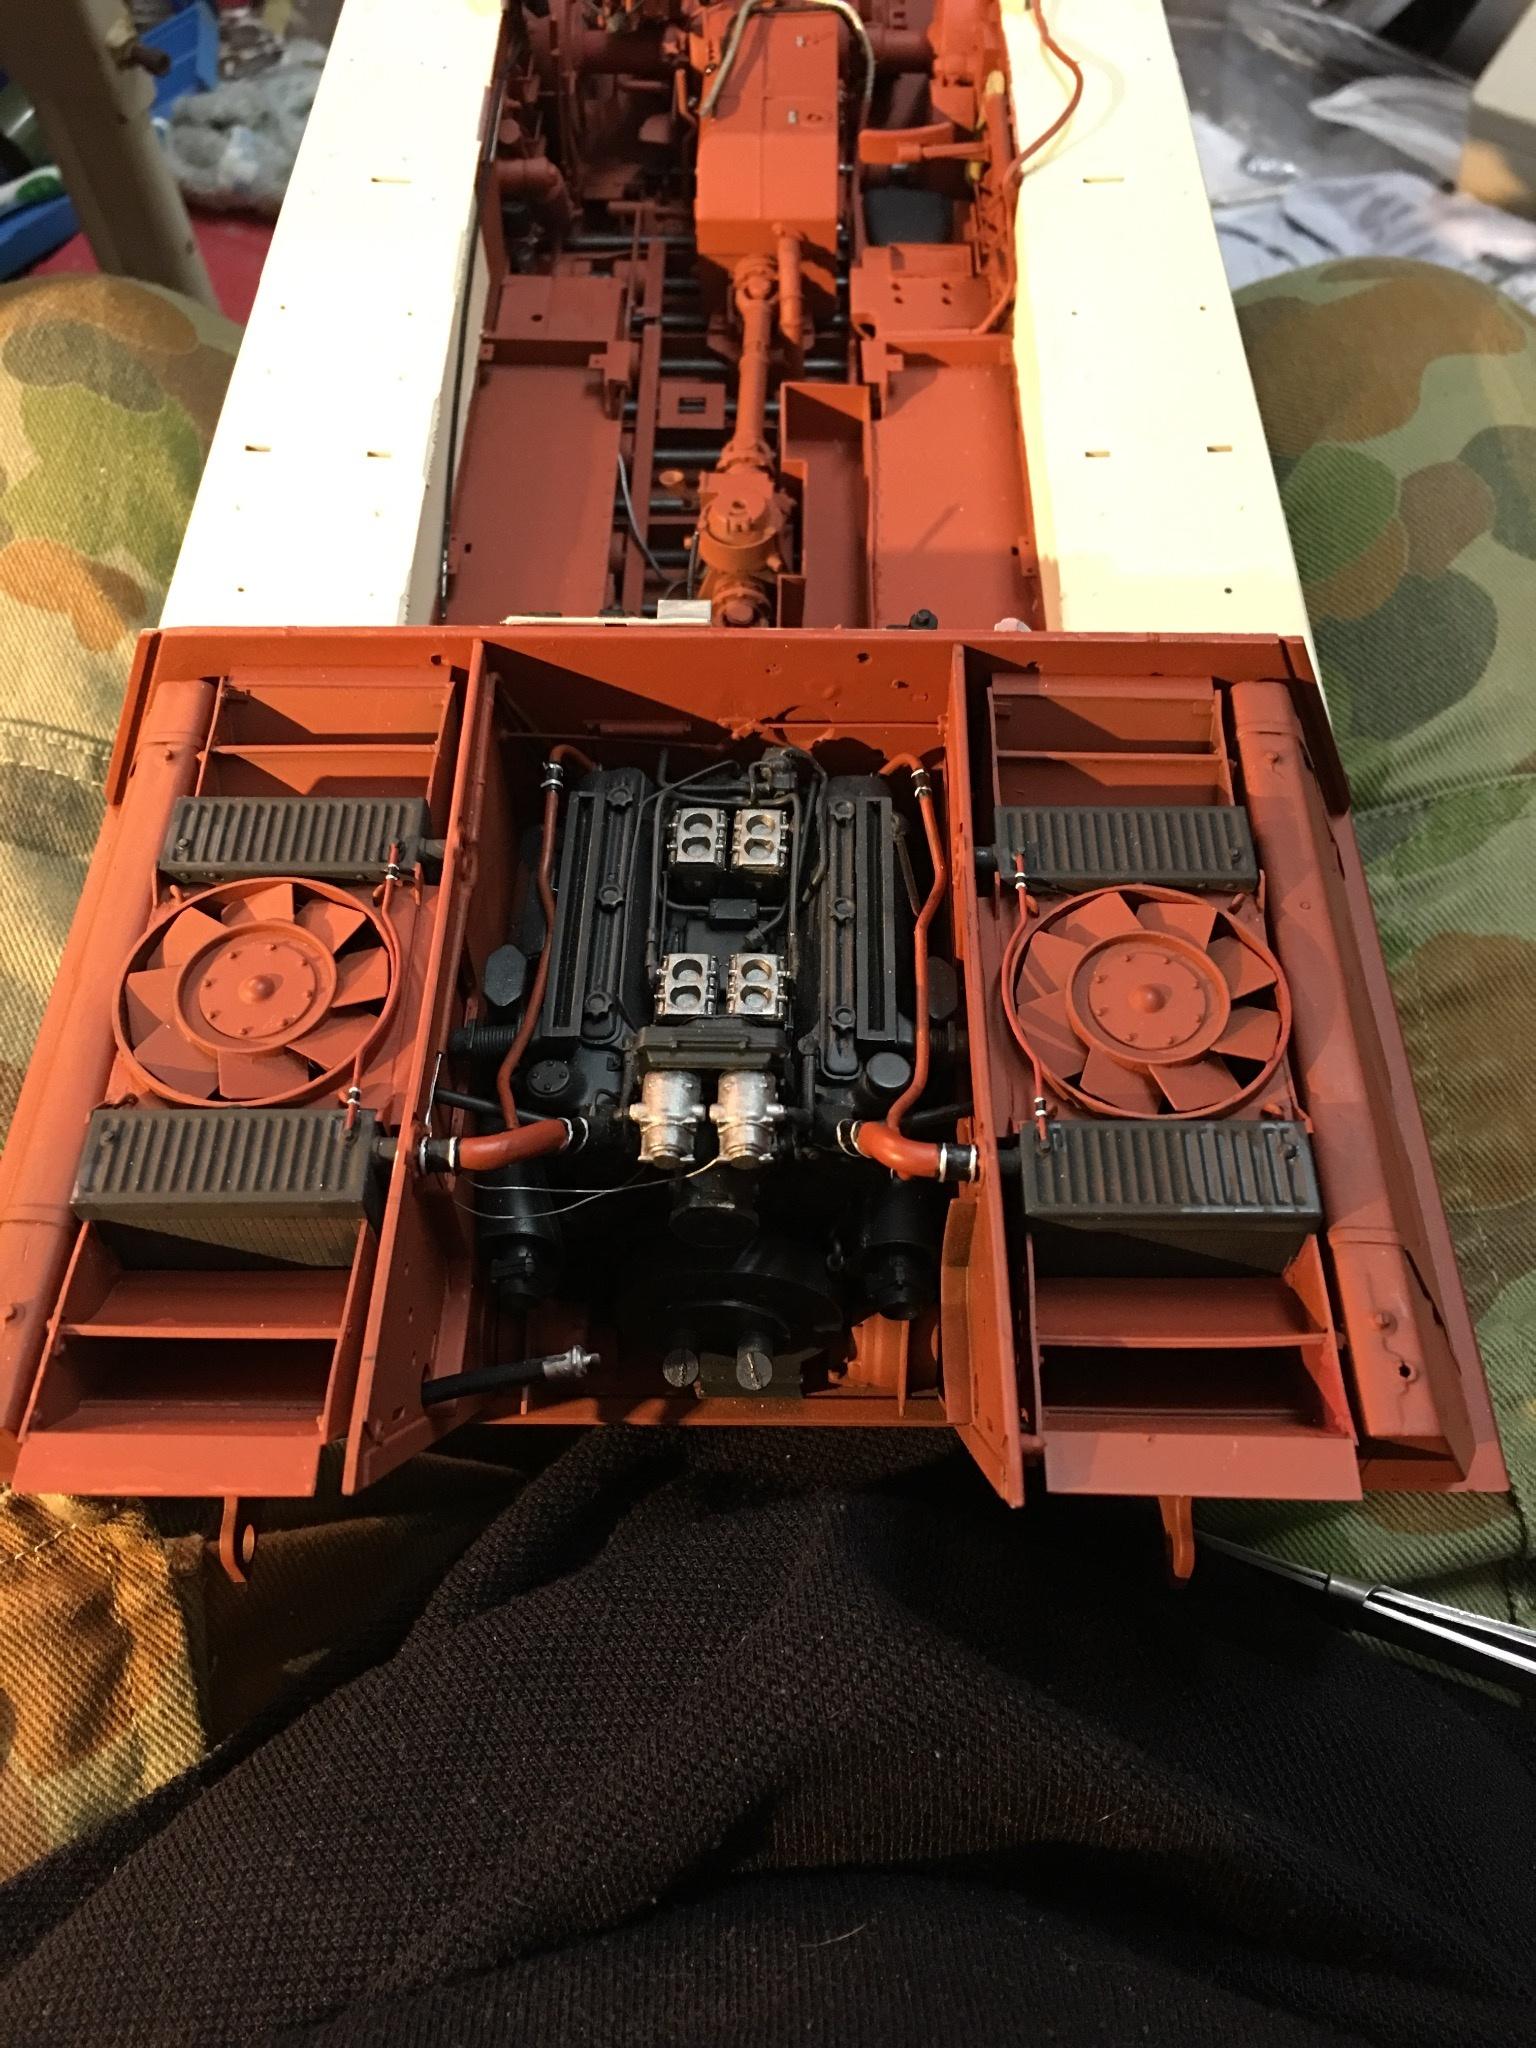 98EC589F-8FBD-4B09-A38B-AF01CF6F6A48.jpeg